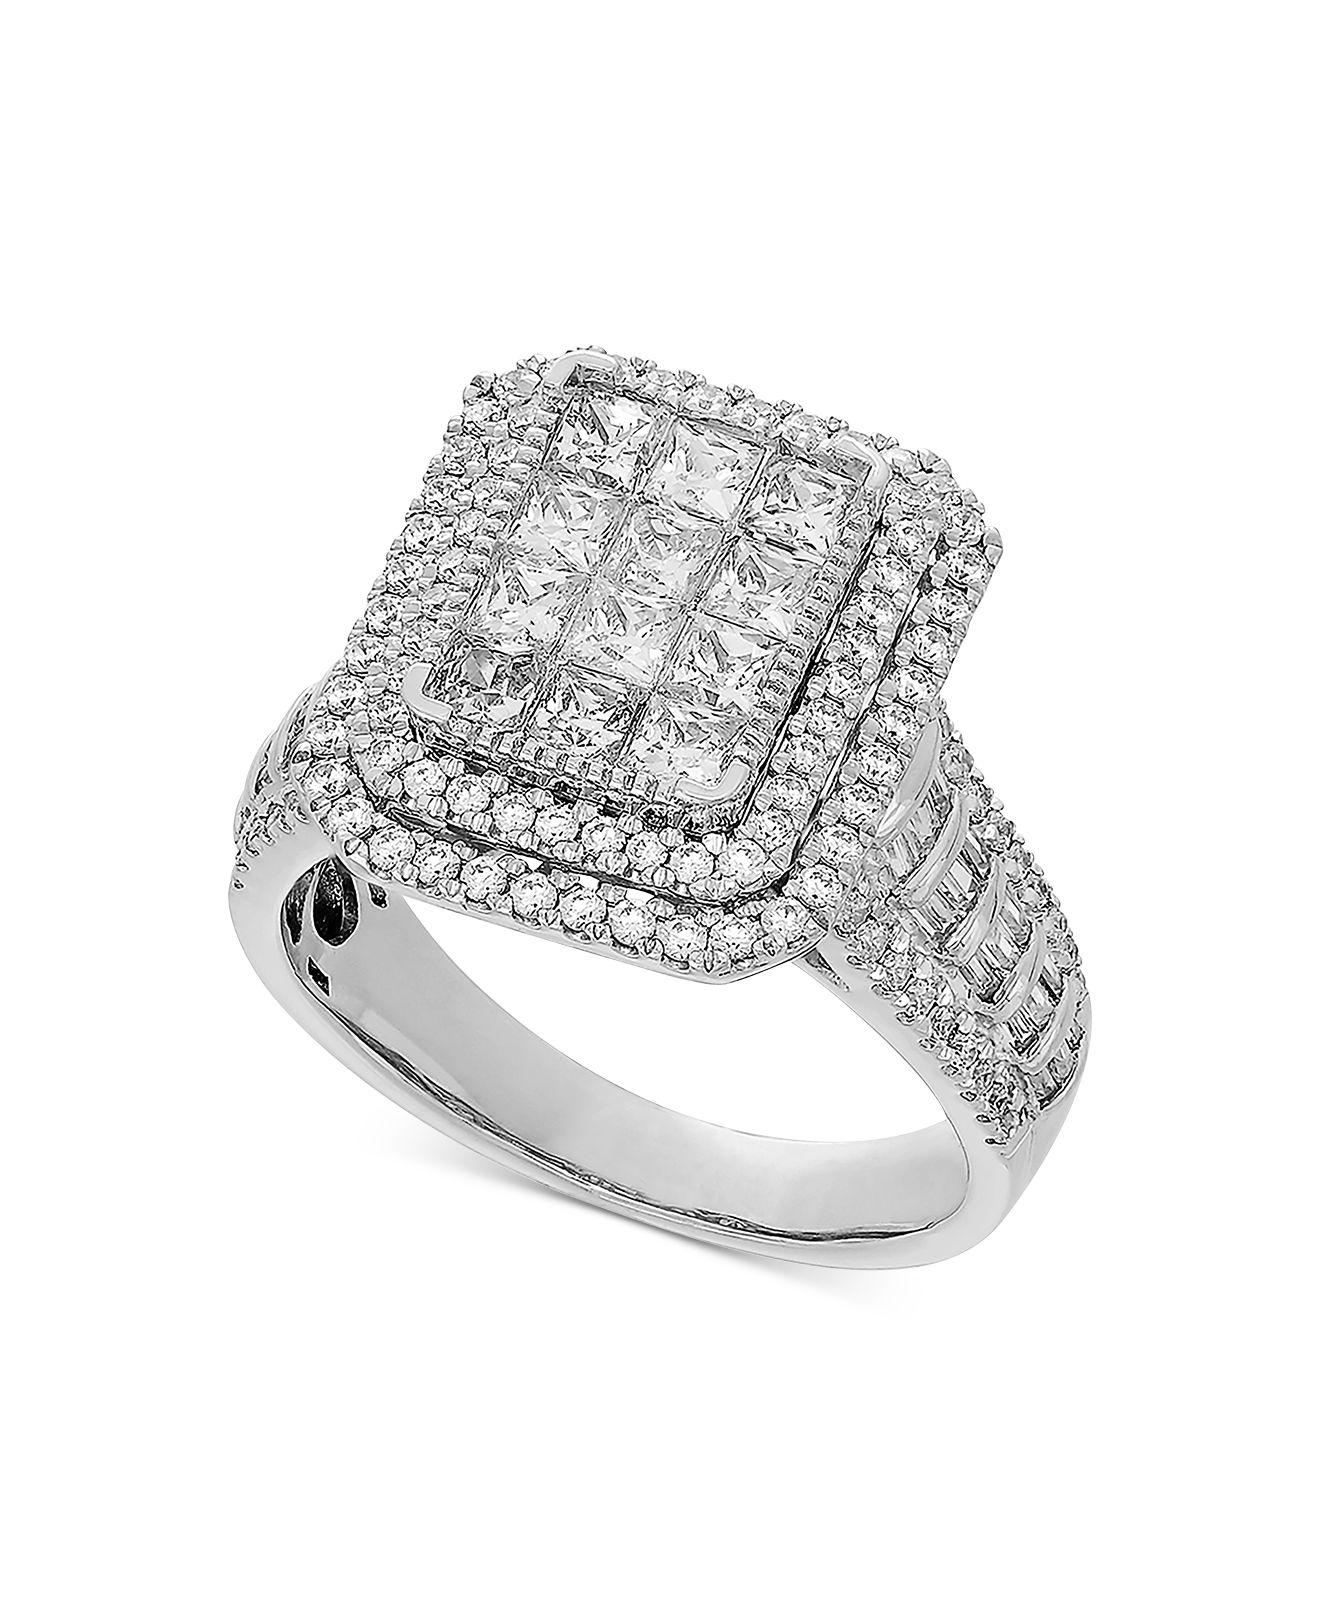 Women S Metallic Diamond Princess Halo Engagement Ring 2 Ct T W In 14k White Gold